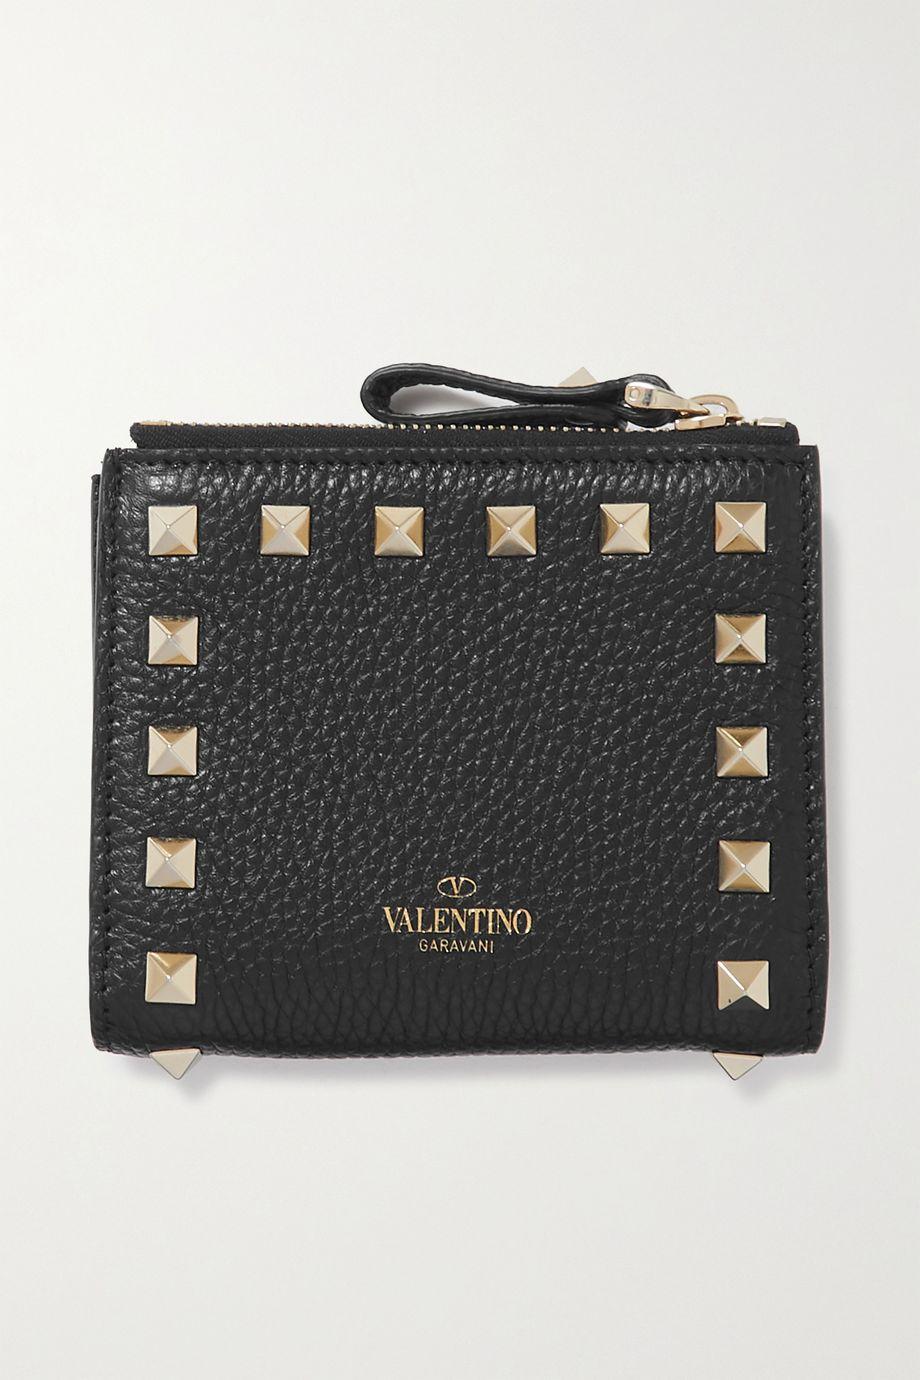 Valentino Valentino Garavani Rockstud textured-leather wallet